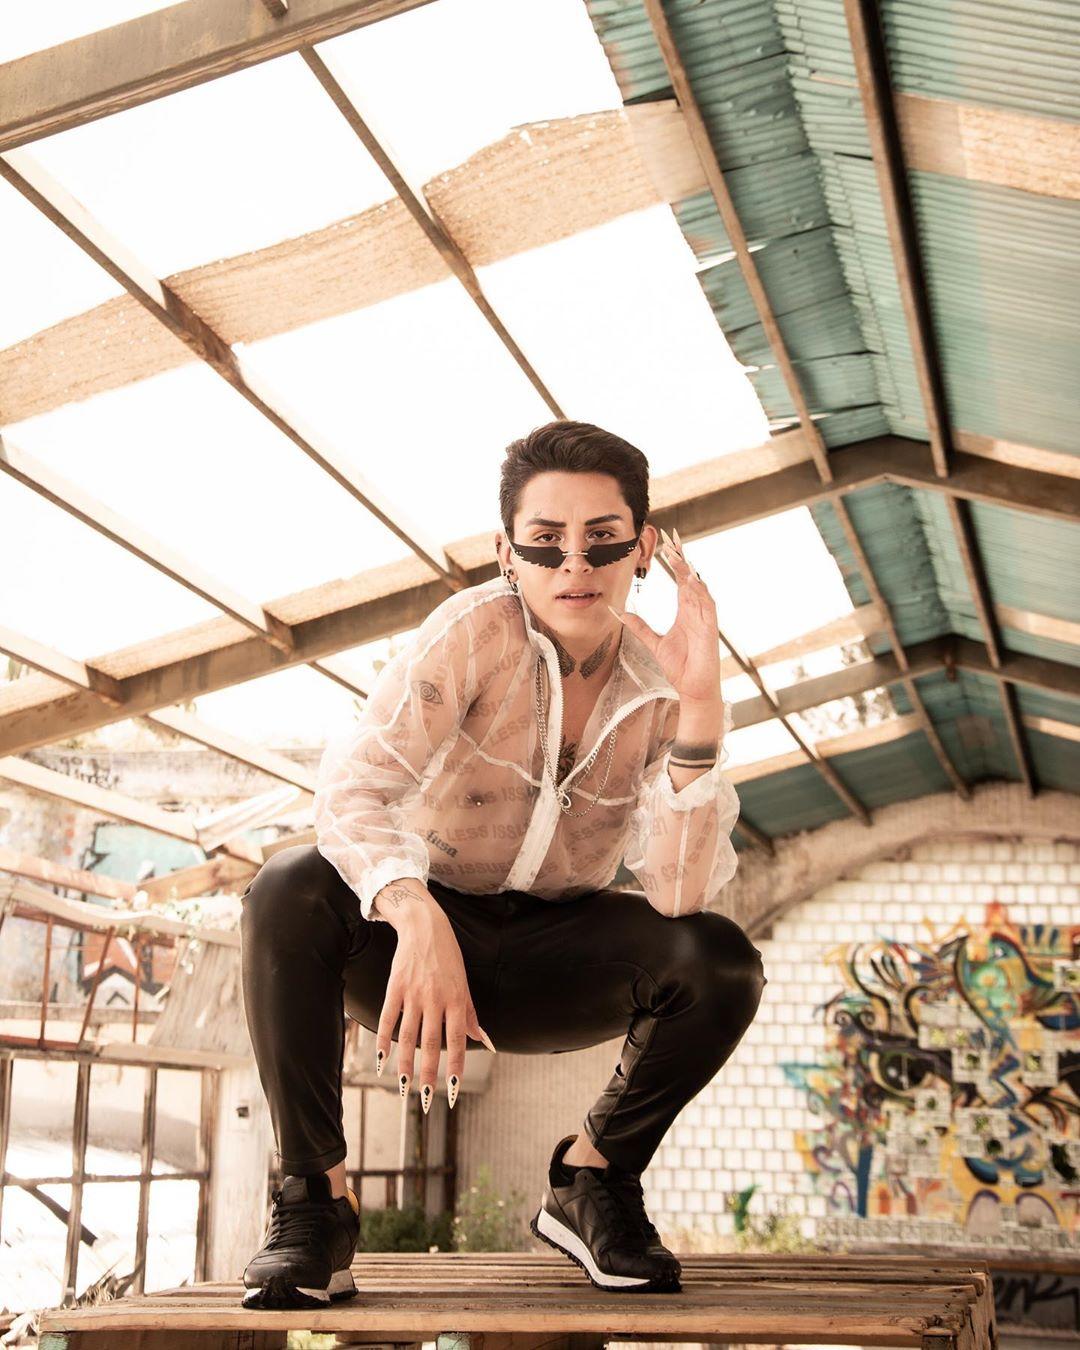 Kunno, influencer de Tik Tok, se retira de redes sociales tras vender saludos